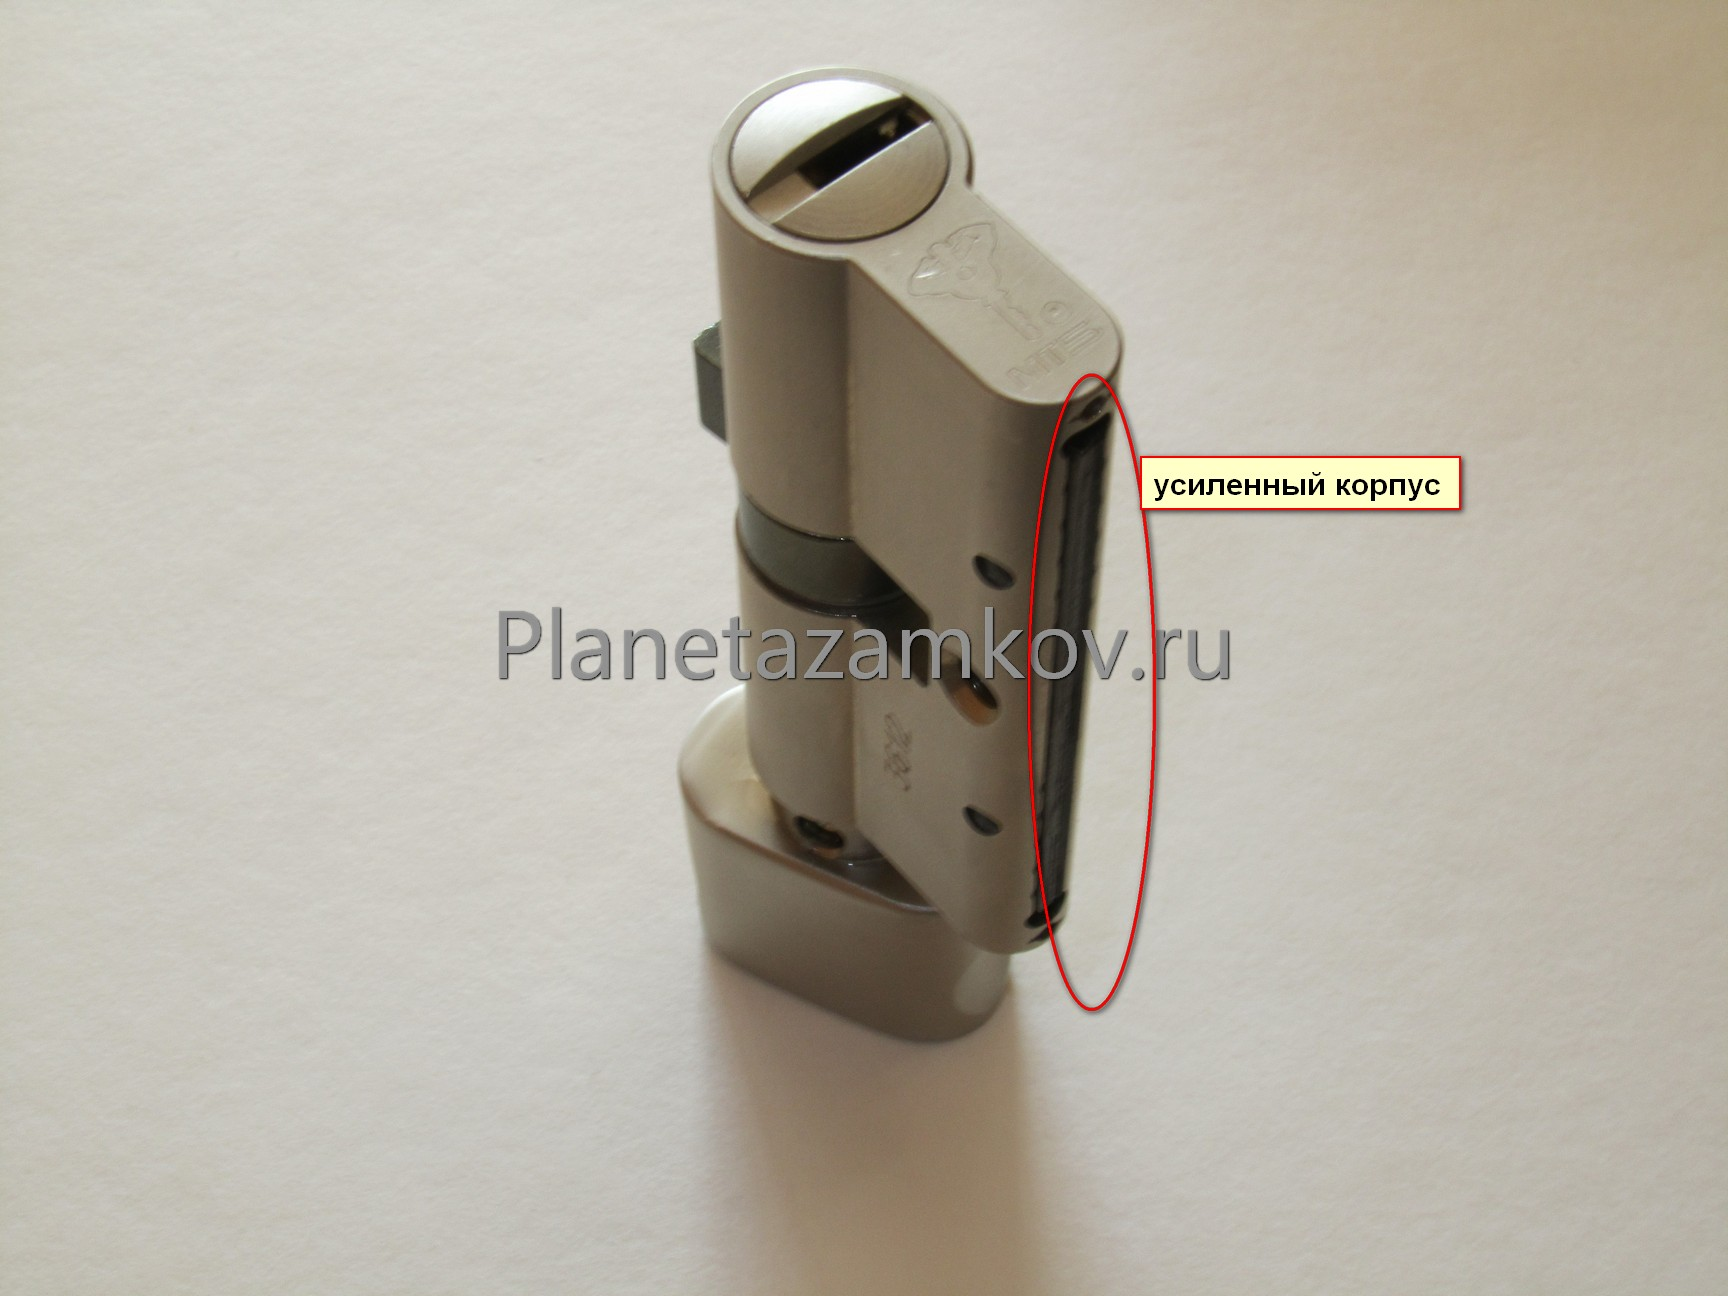 Усиленный цилиндр Mul-t-lock MT5 защита от перелома